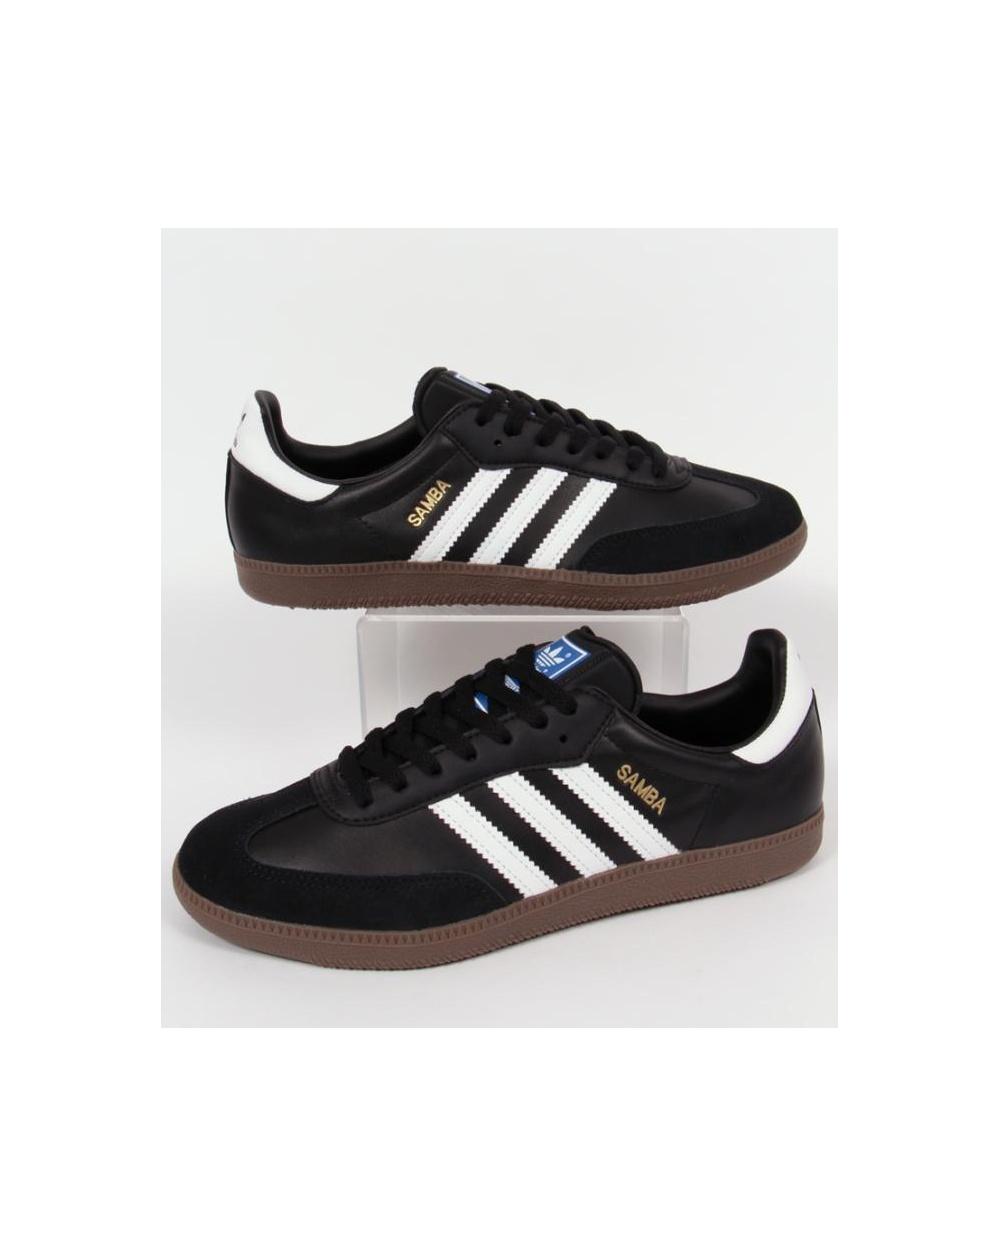 black adidas samba trainers